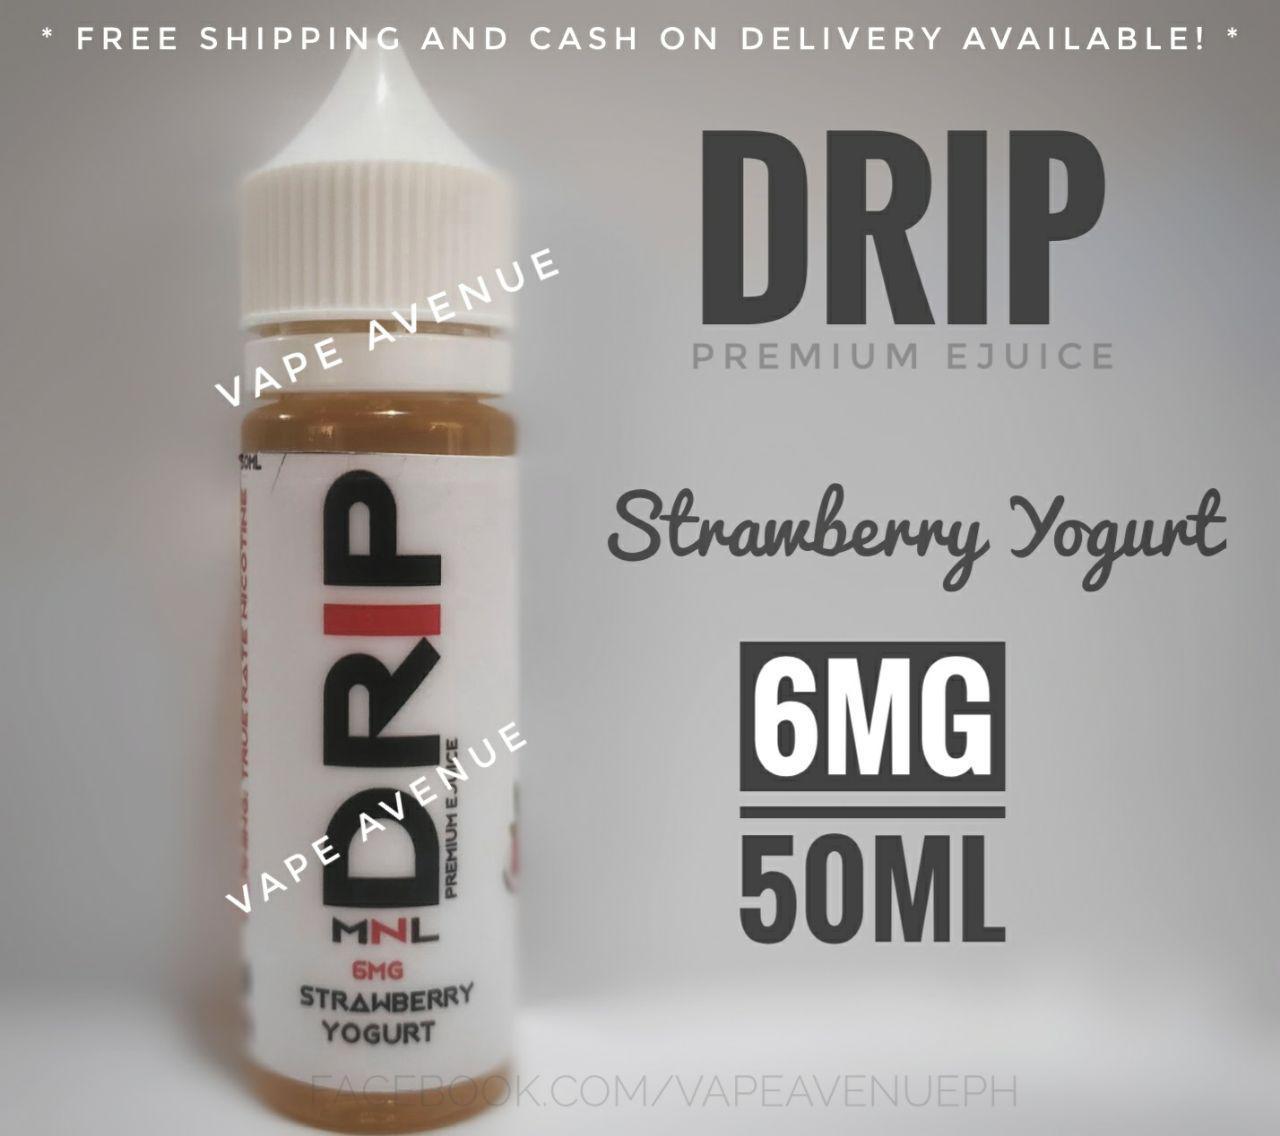 DRiP Premium e Liquid 50ML 3MG / 6MG Premium [ All Flavors ] eliquid e  juice vape juice kit